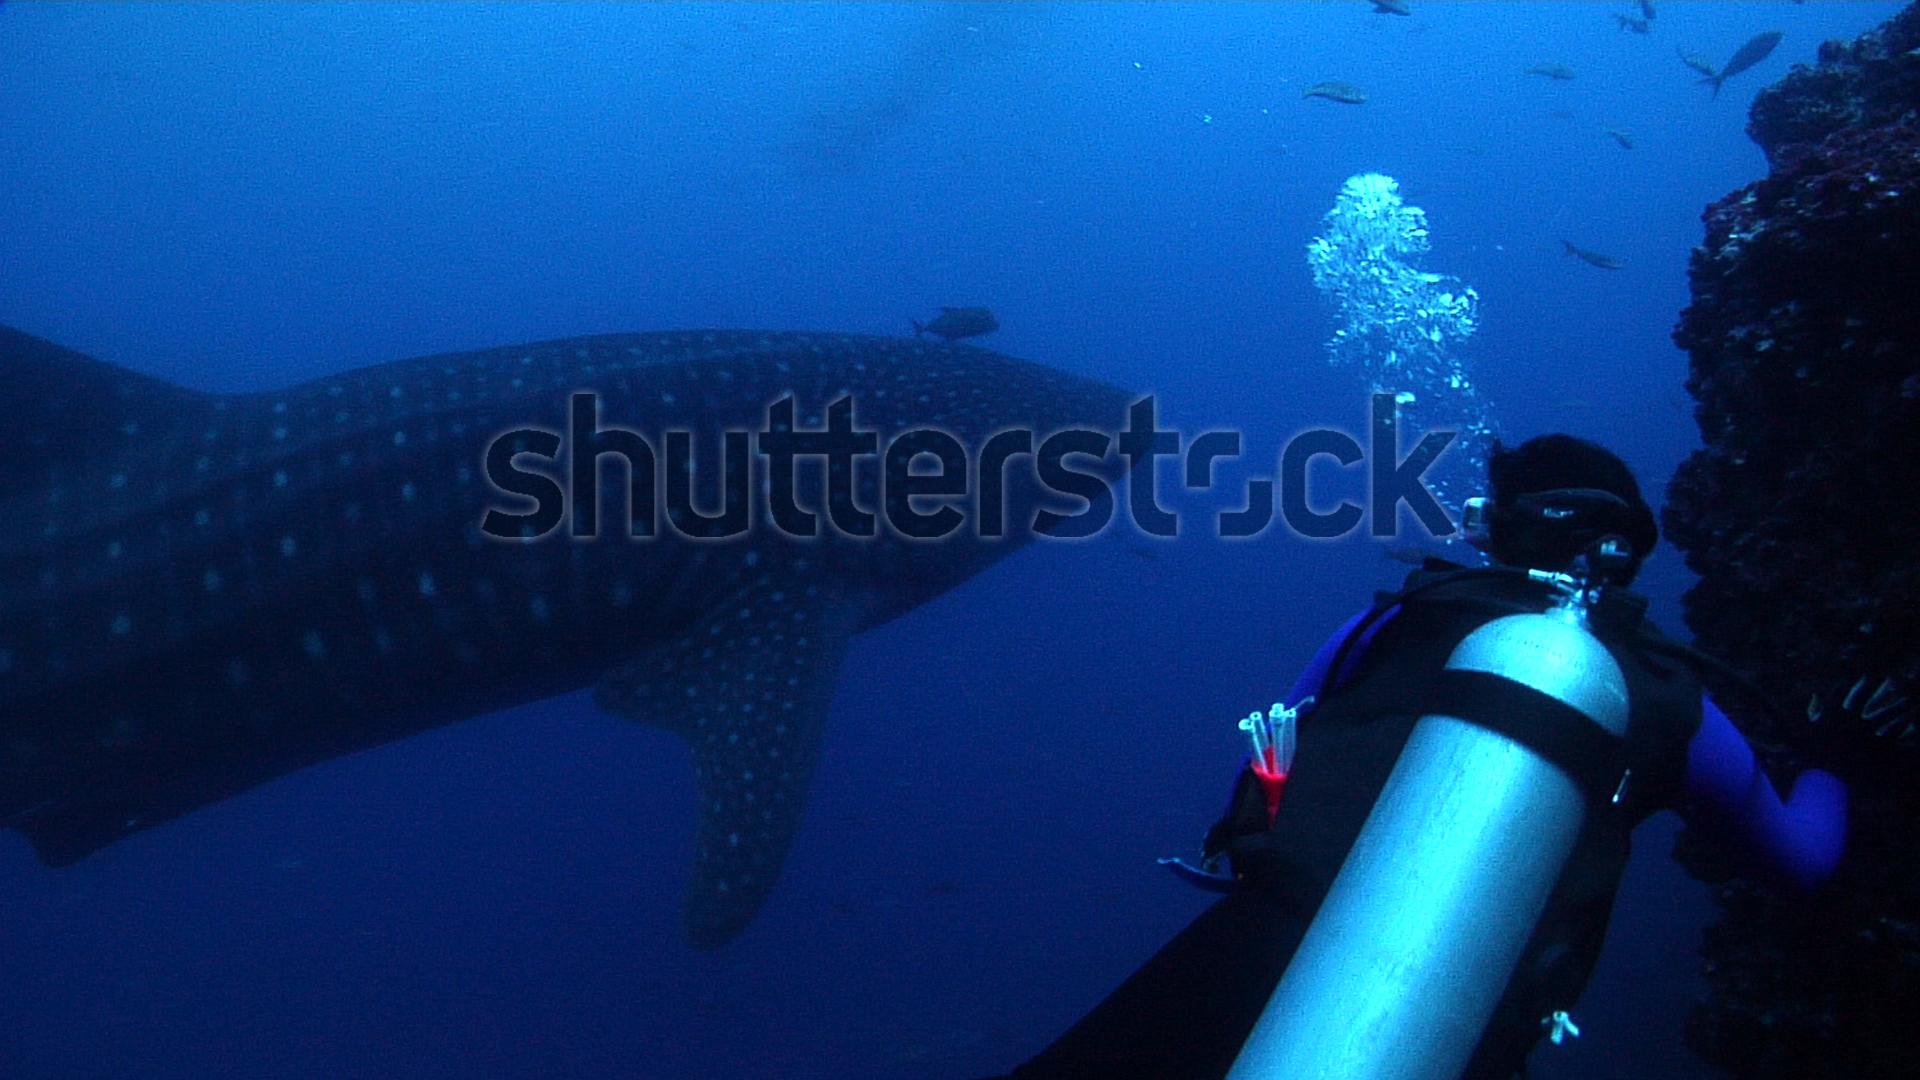 Shutterstock Offers Astounding Underwater Footage from Josh Jensen 4